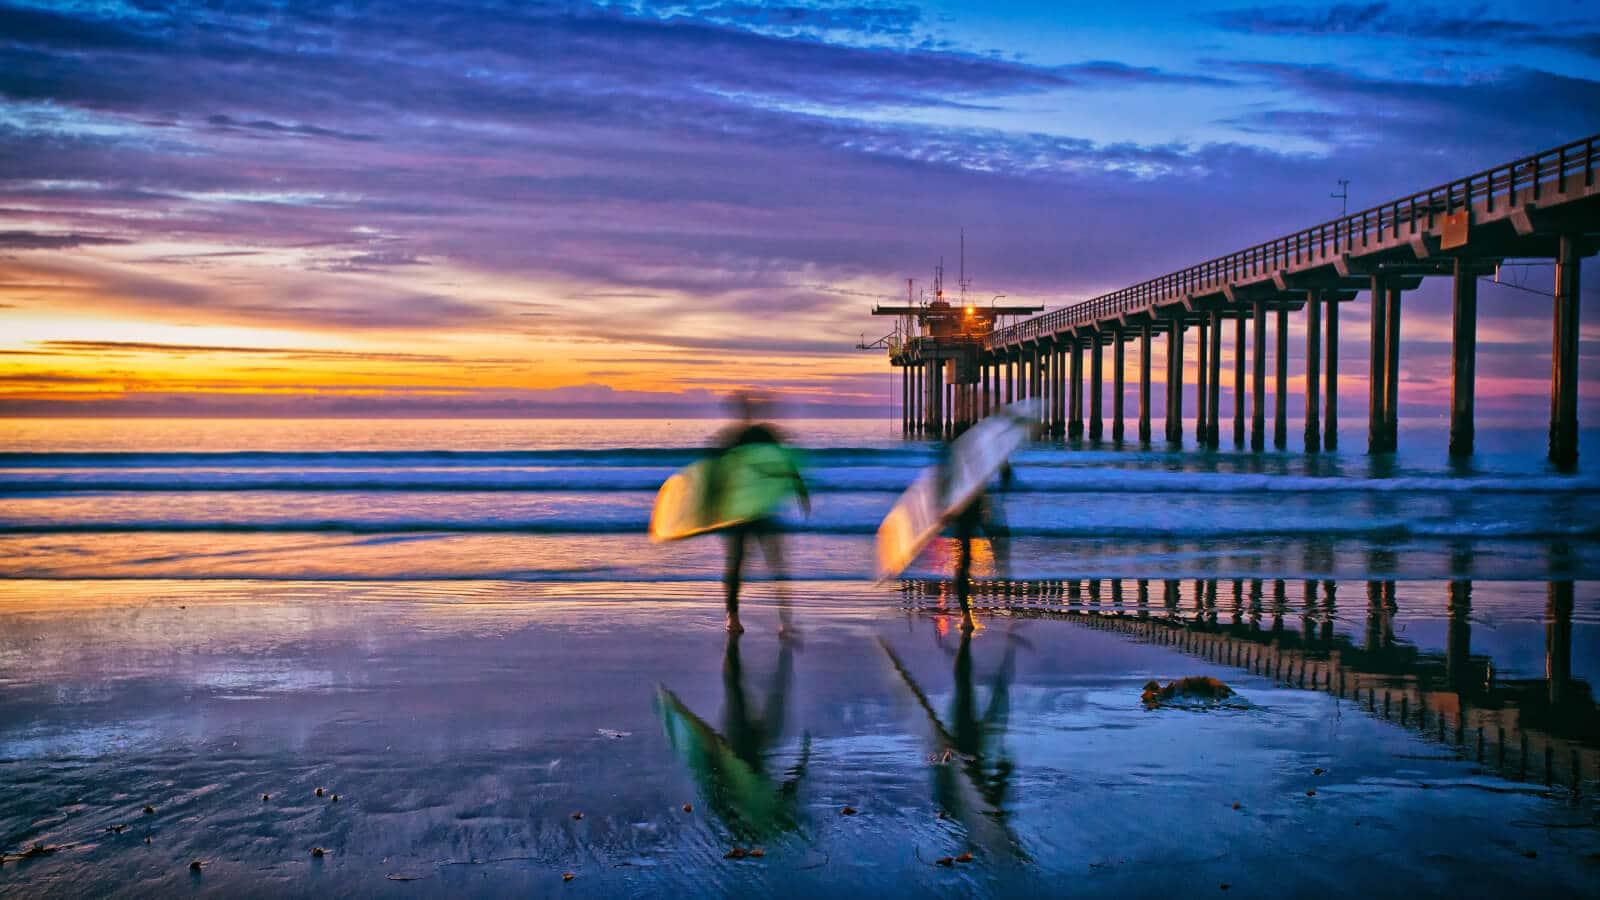 Surfers At Sunset At La Jolla Beach, San Diego, California